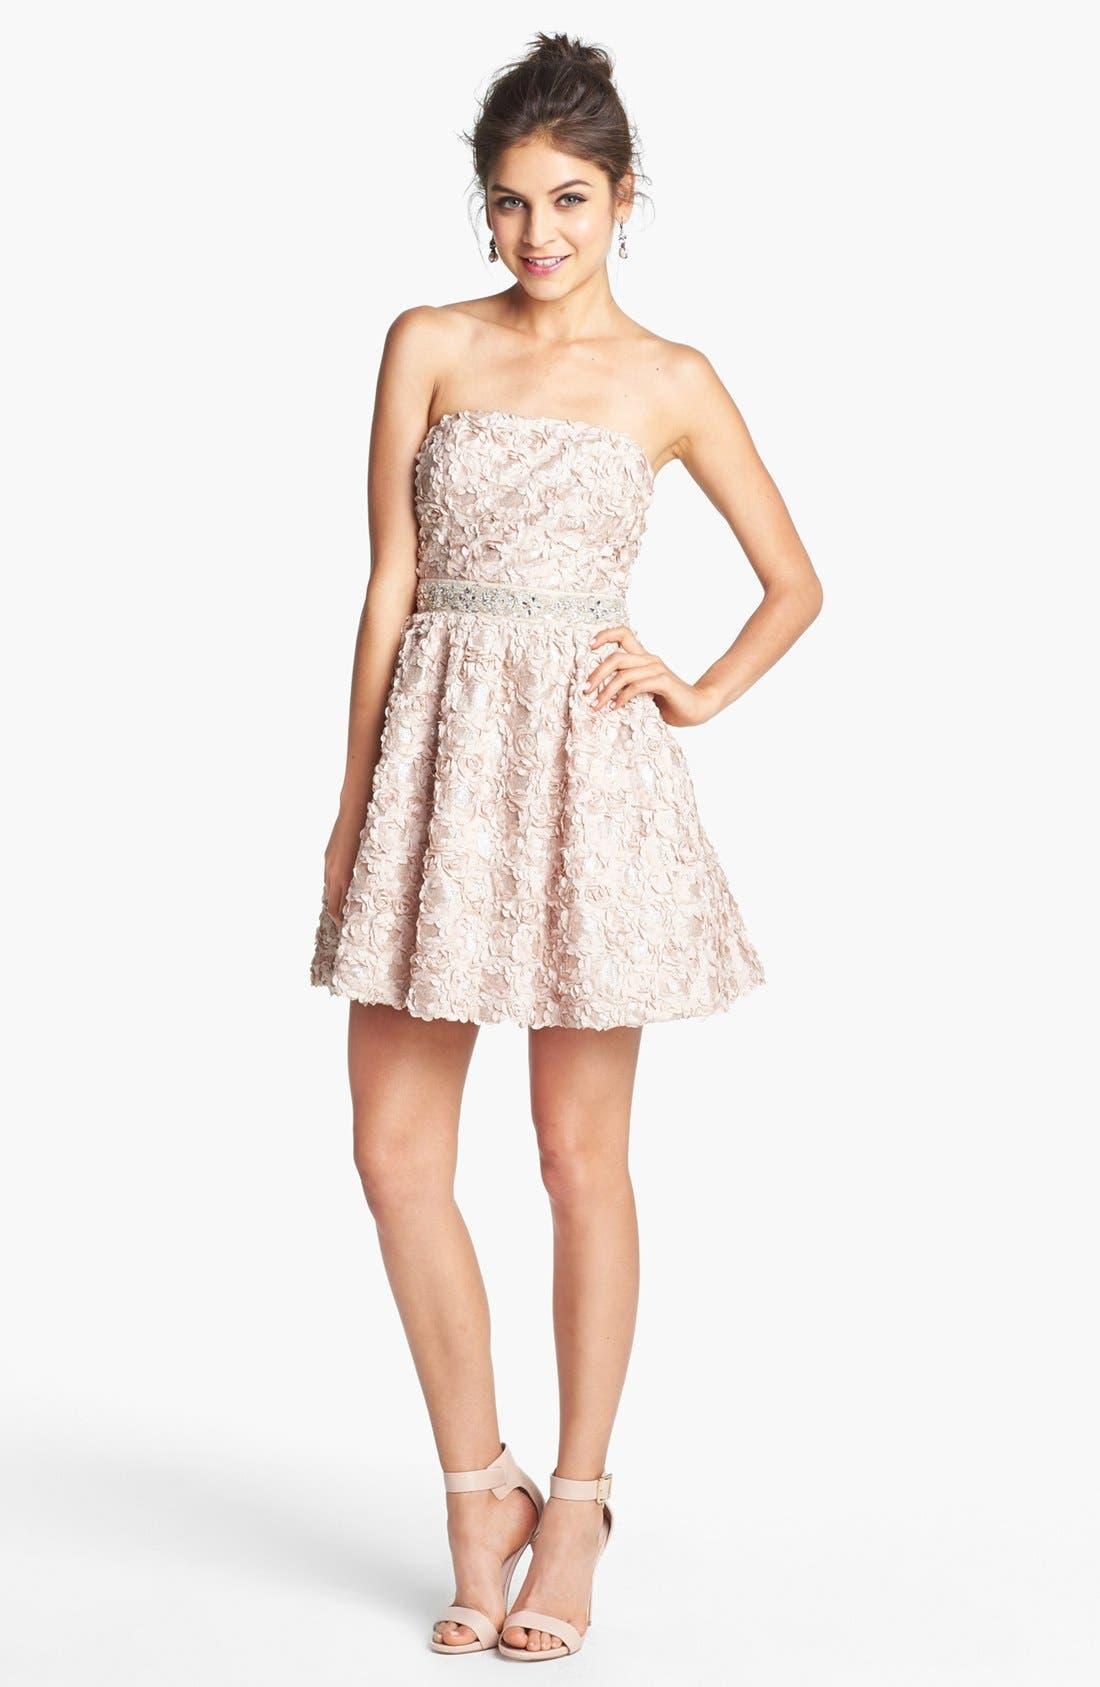 Alternate Image 1 Selected - As U Wish Embellished Rosette Strapless Dress (Juniors) (Online Only)